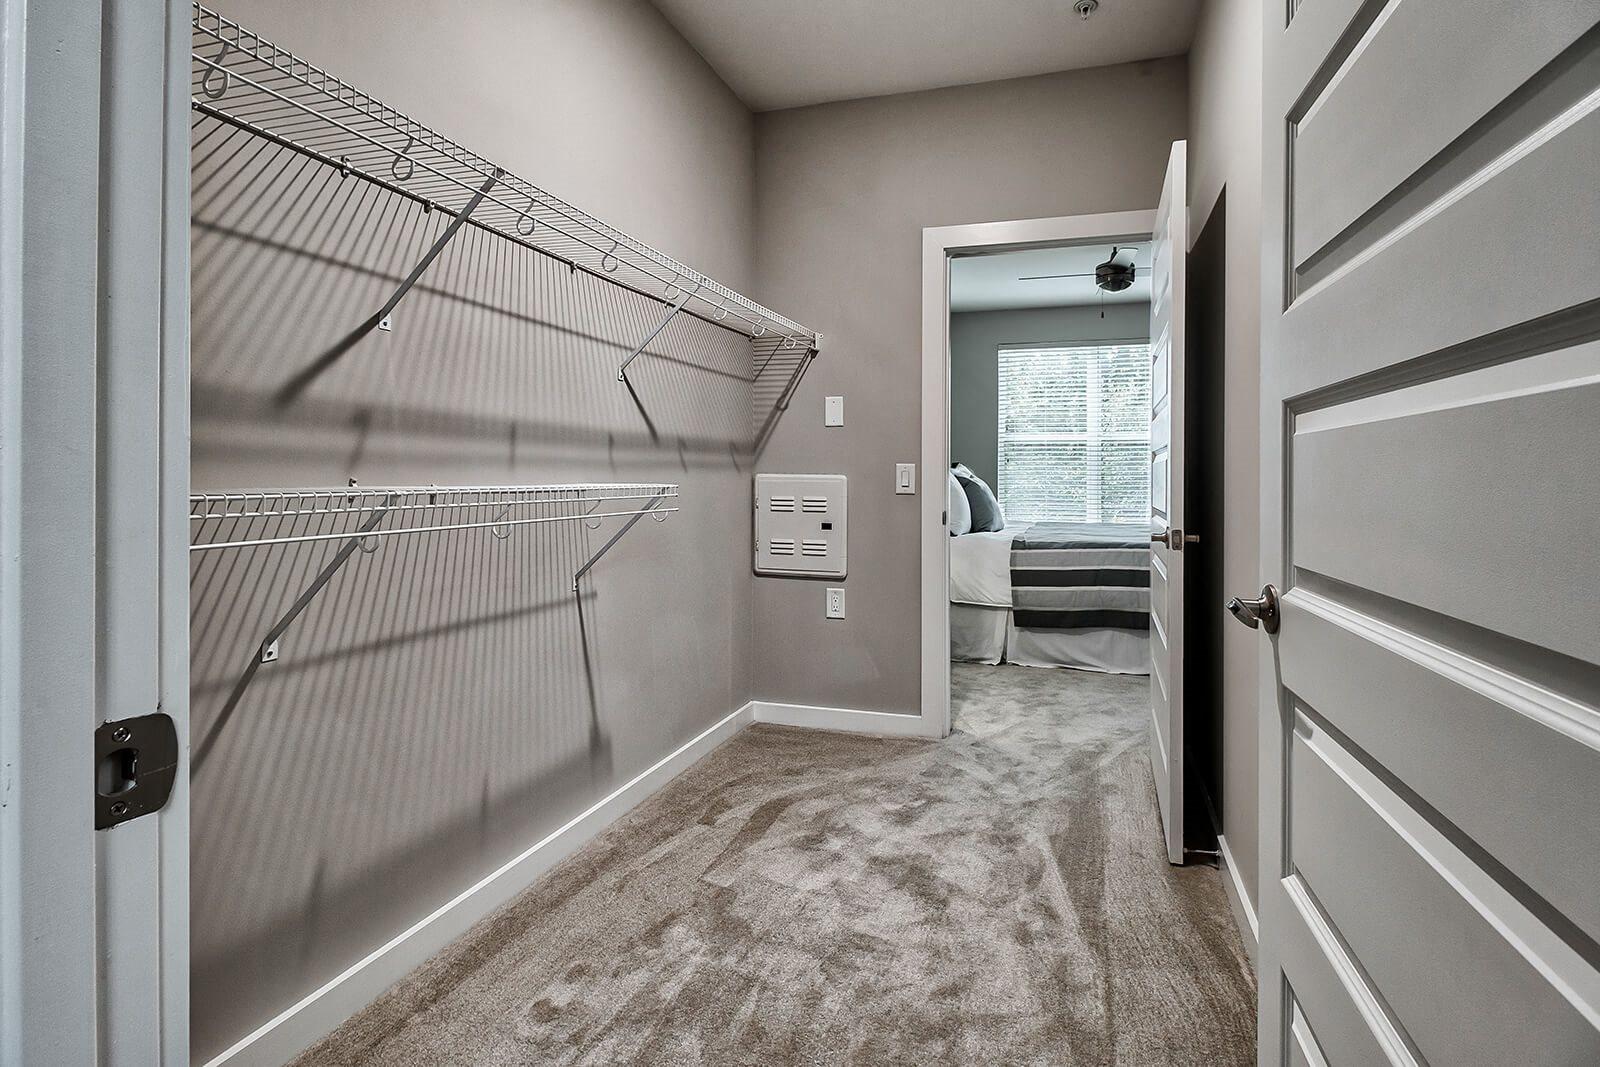 Walk-In Closets with Built-in Shelving at Morningside Atlanta by Windsor, Atlanta, Georgia